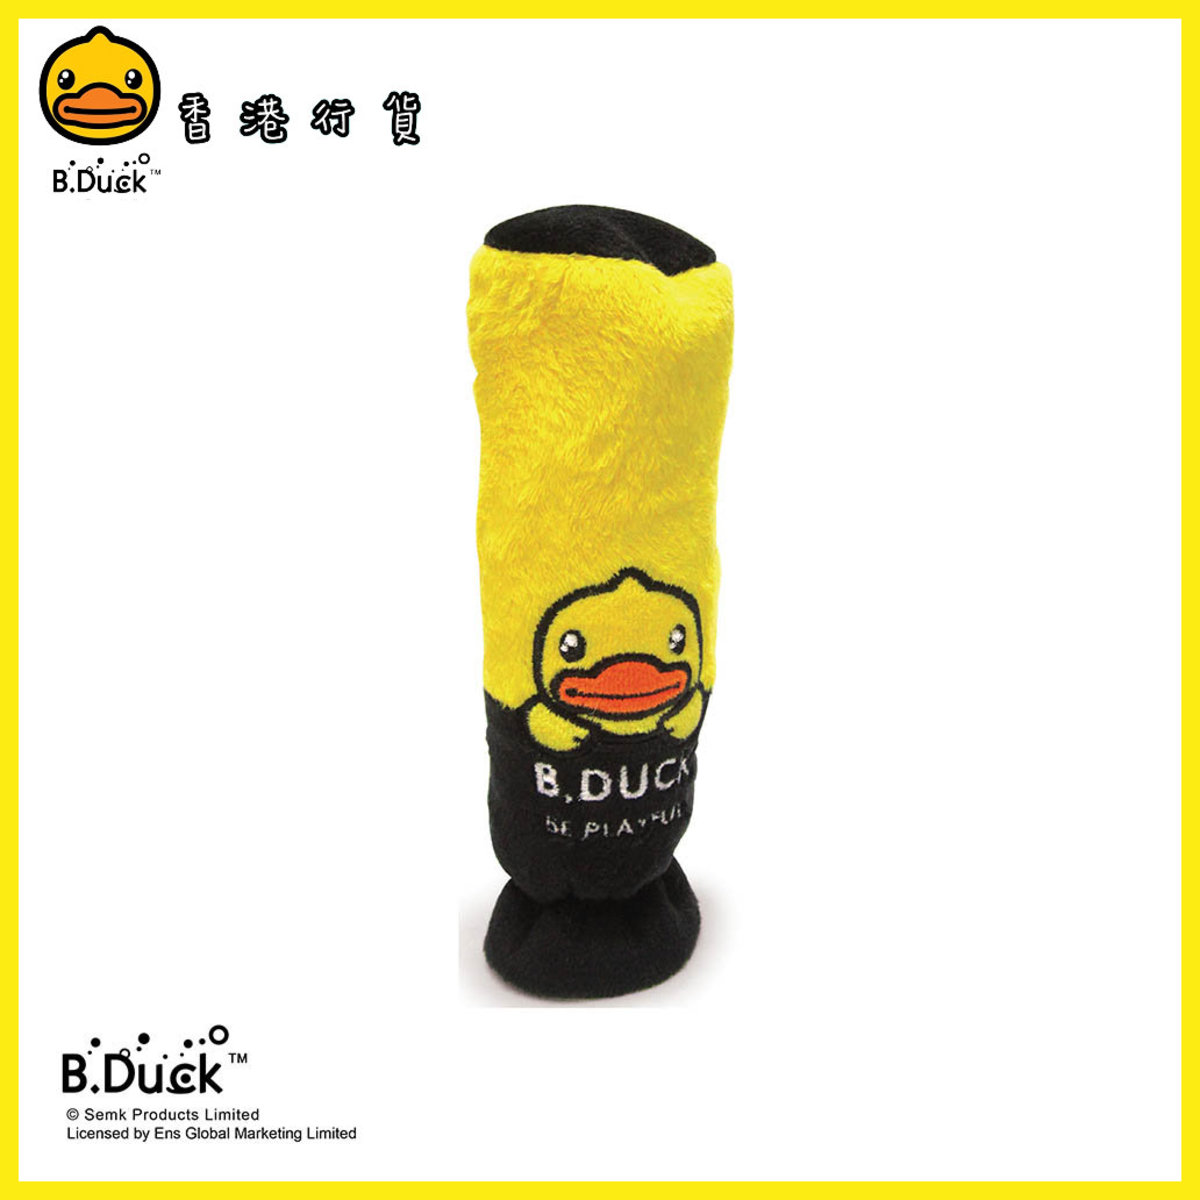 B.Duck Handbrake Cover